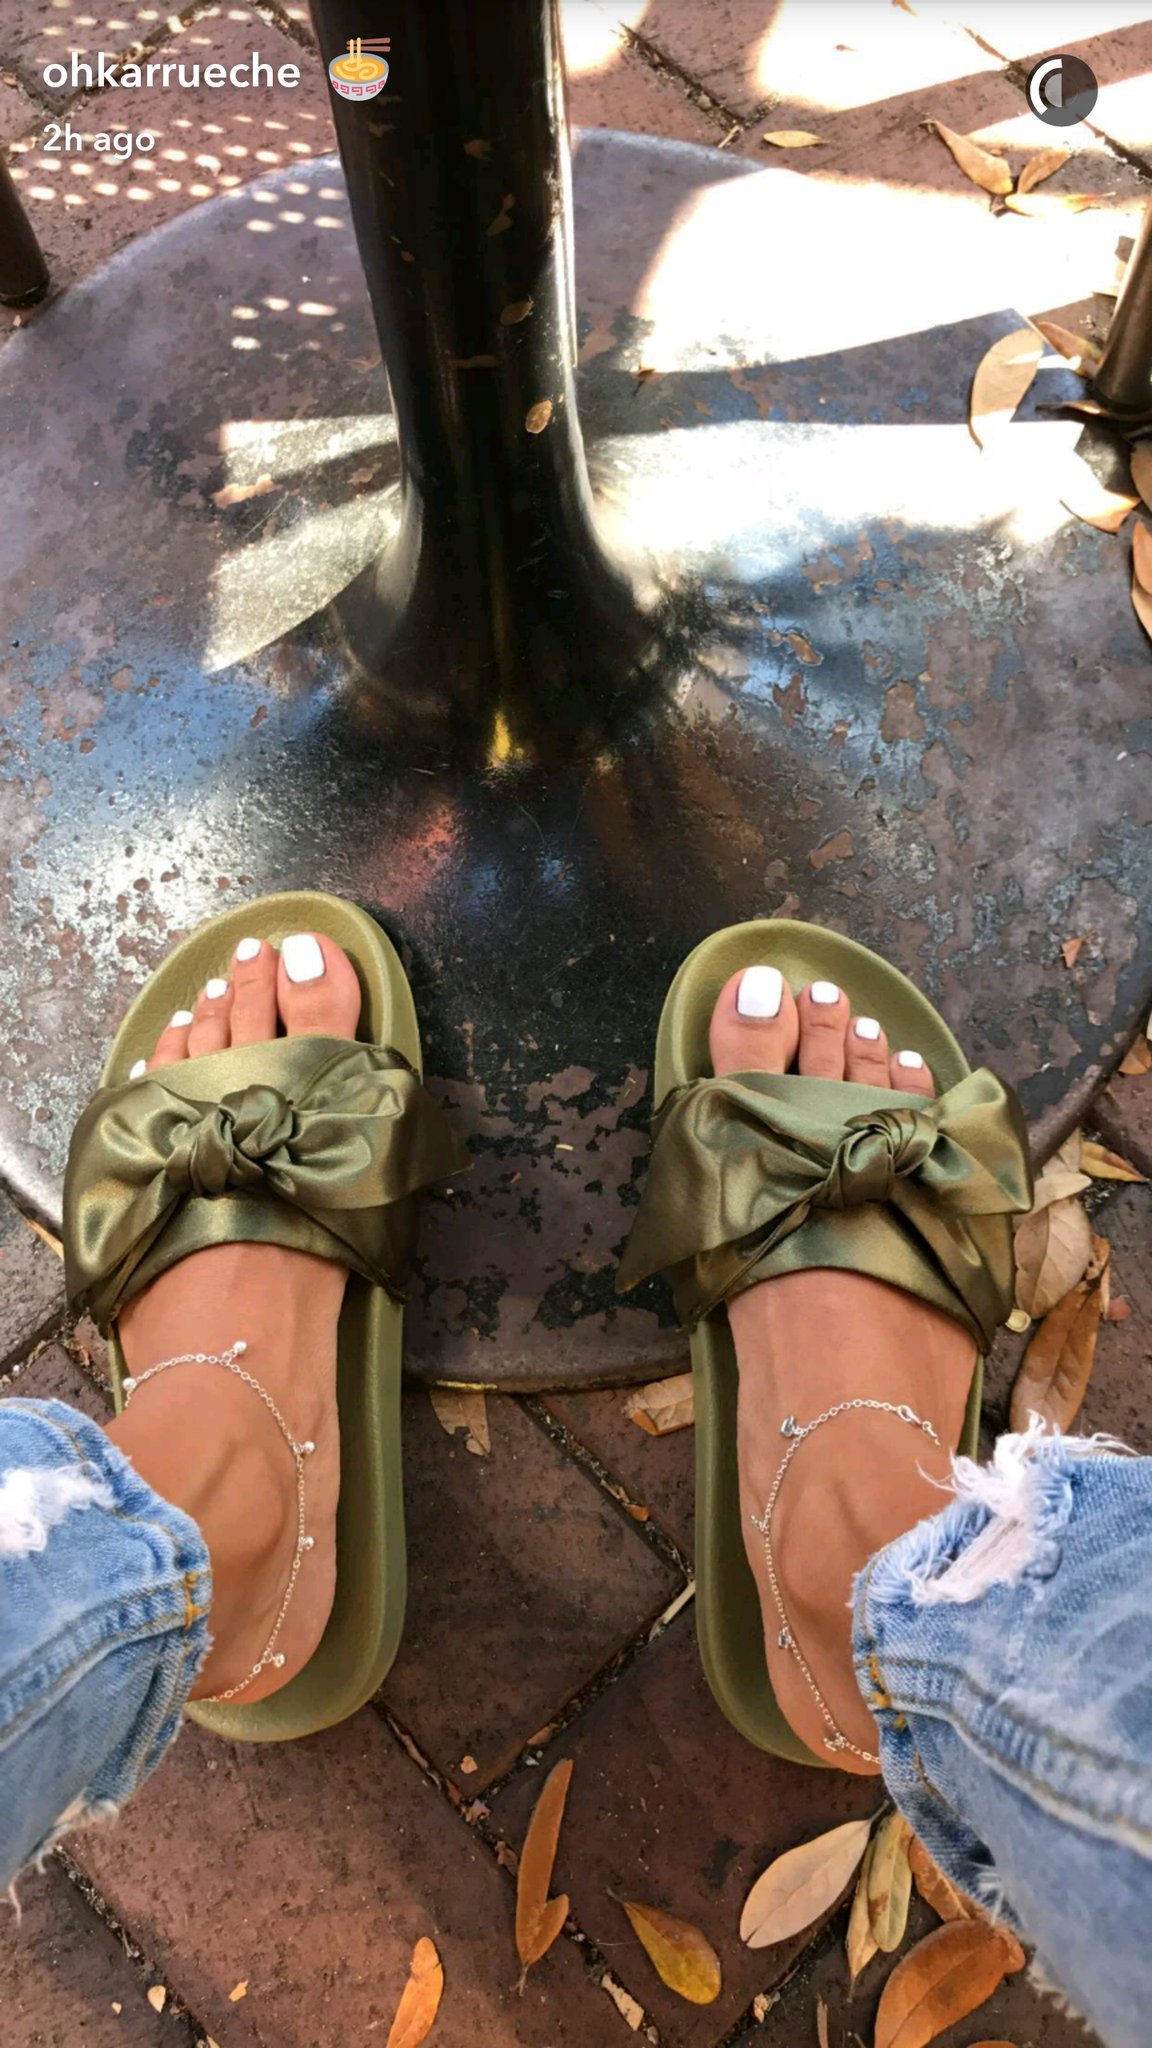 Karrueche Tran weaeing Rihanna's Puma sliders.